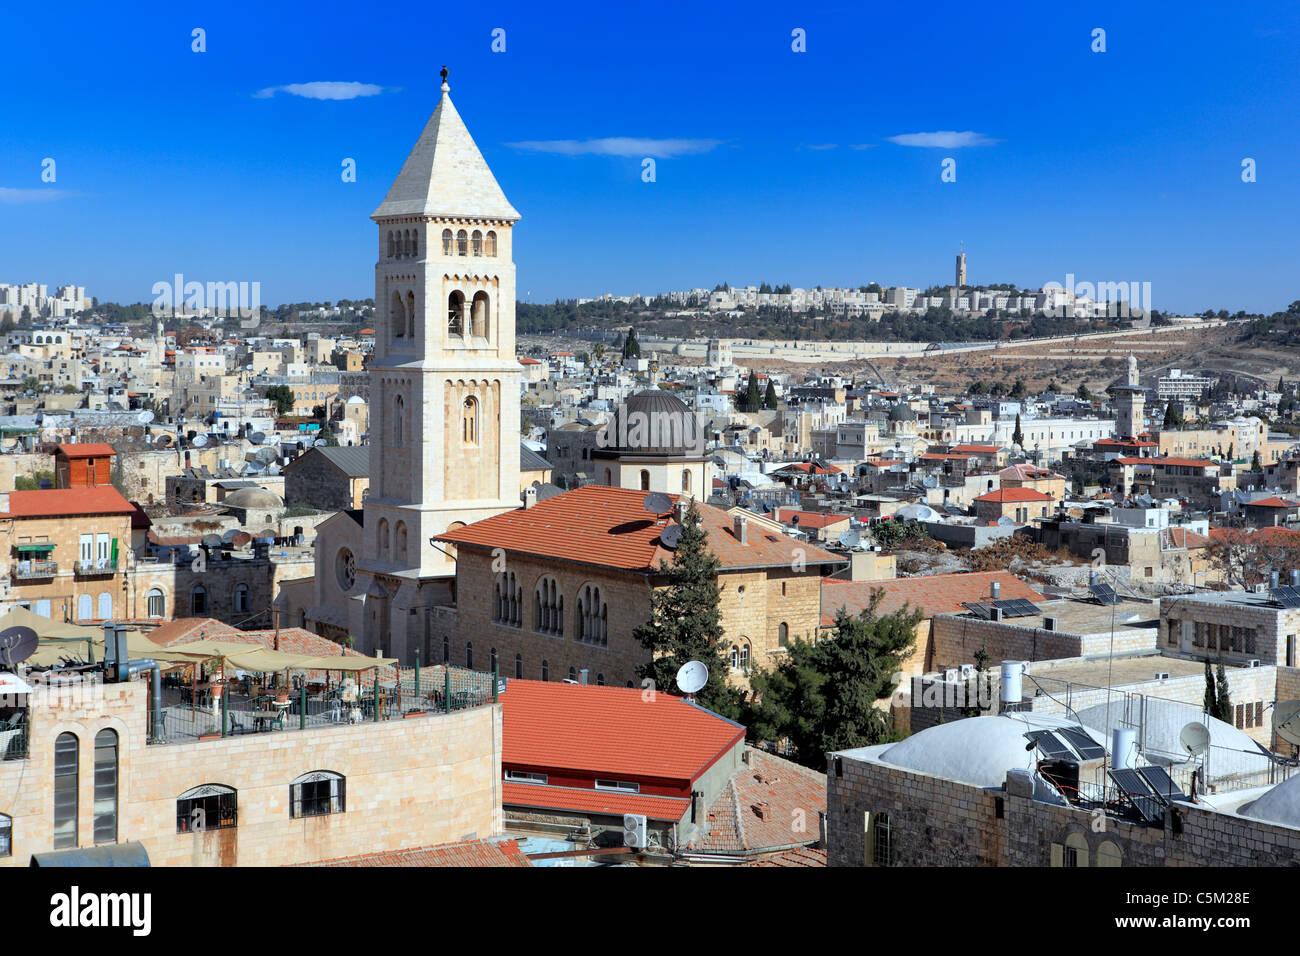 Syrian church of St. Mark (12th century), Jerusalem, Israel - Stock Image